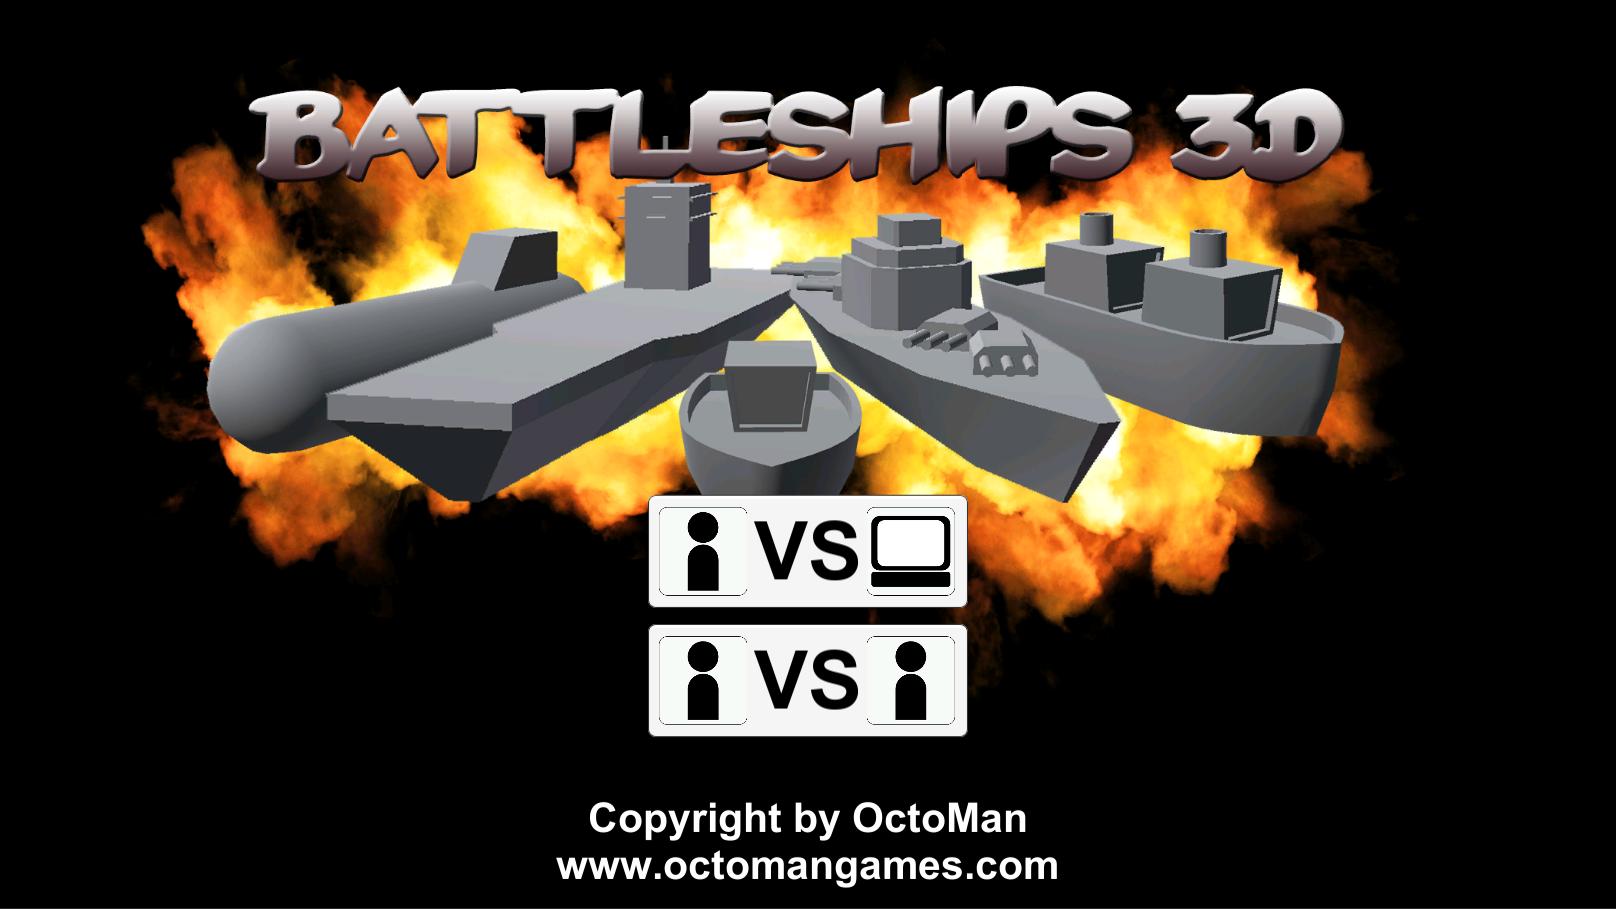 Complete Battleships 3D Pack